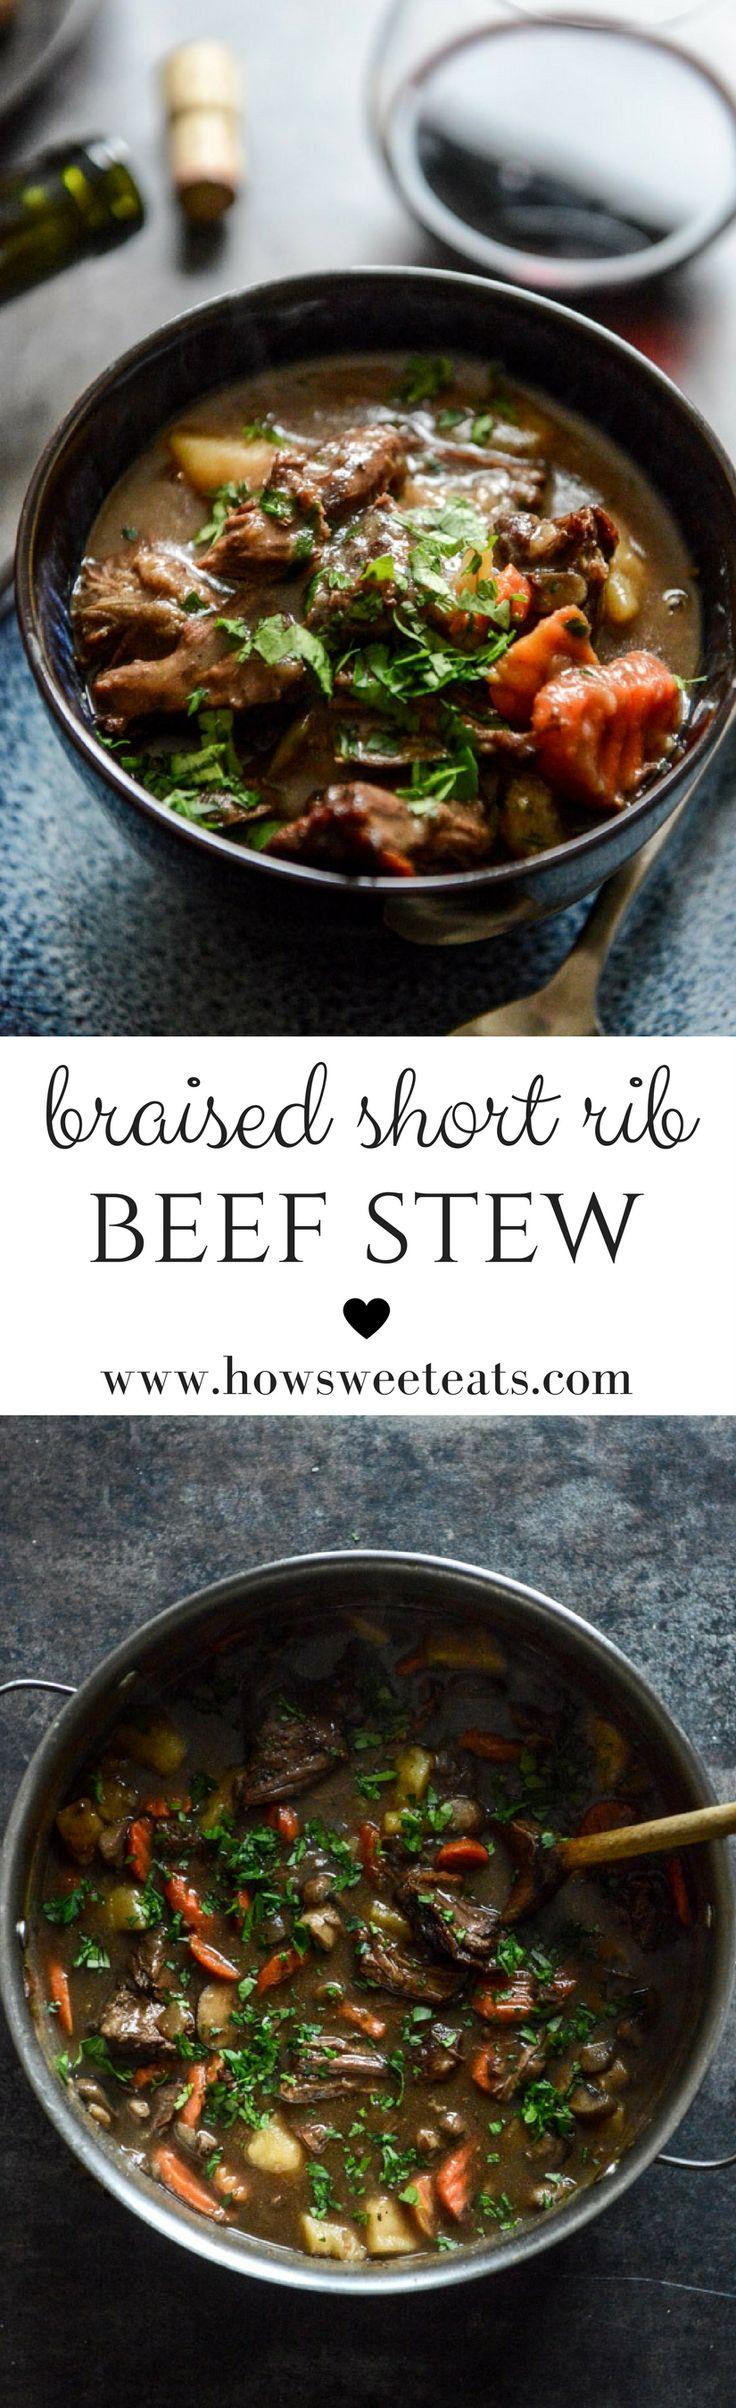 Braised Short Rib Beef Stew I howsweeteats.com @howsweeteats